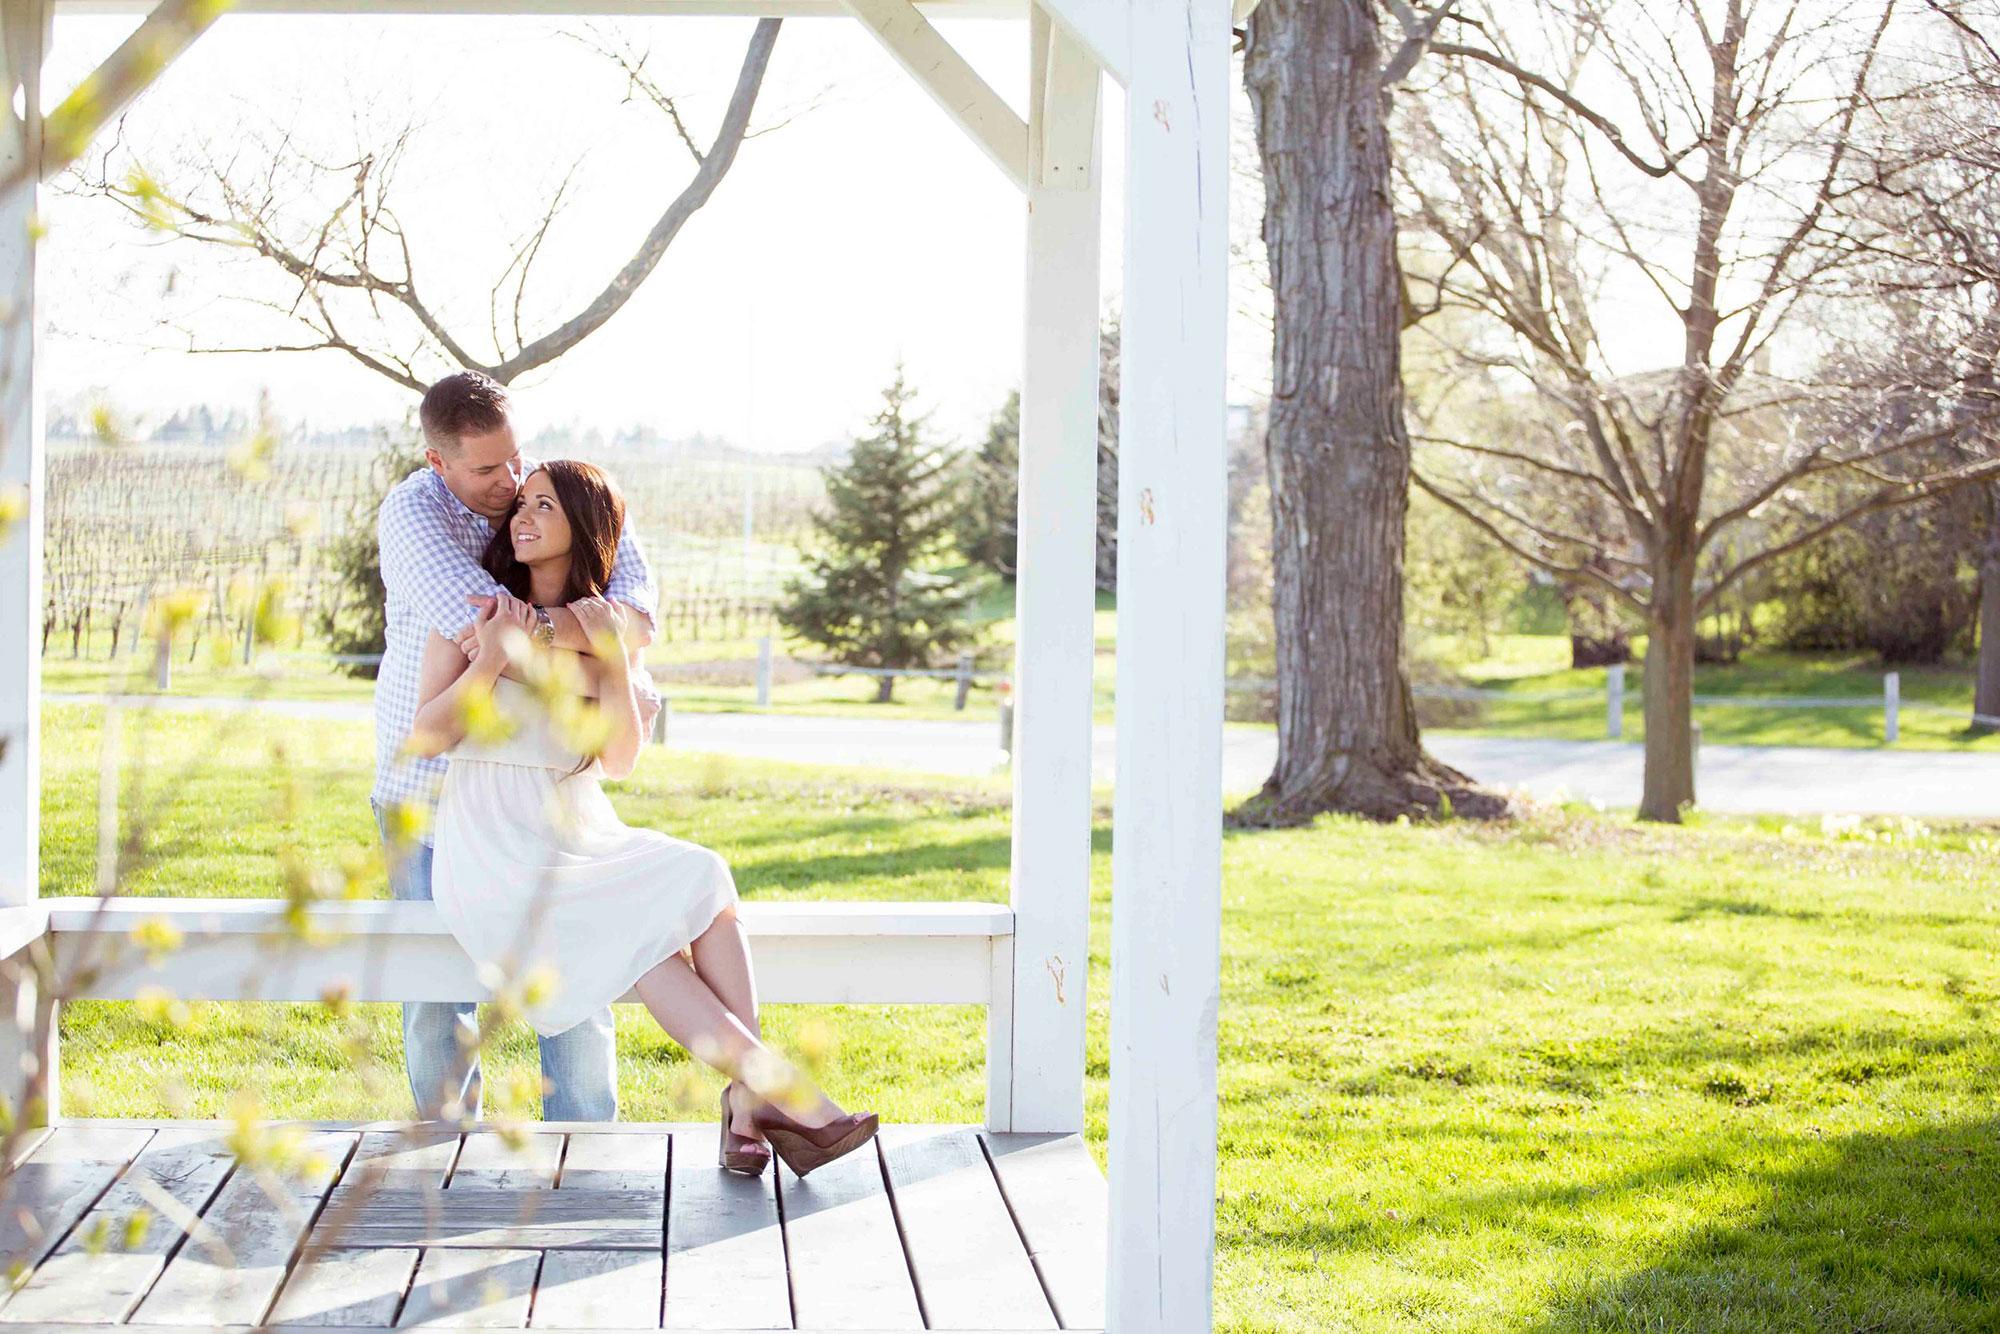 Niagara-on-the-Lake-Engagement-Vineyard-Bride-Photo-By-Gemini-Photography-024.jpg